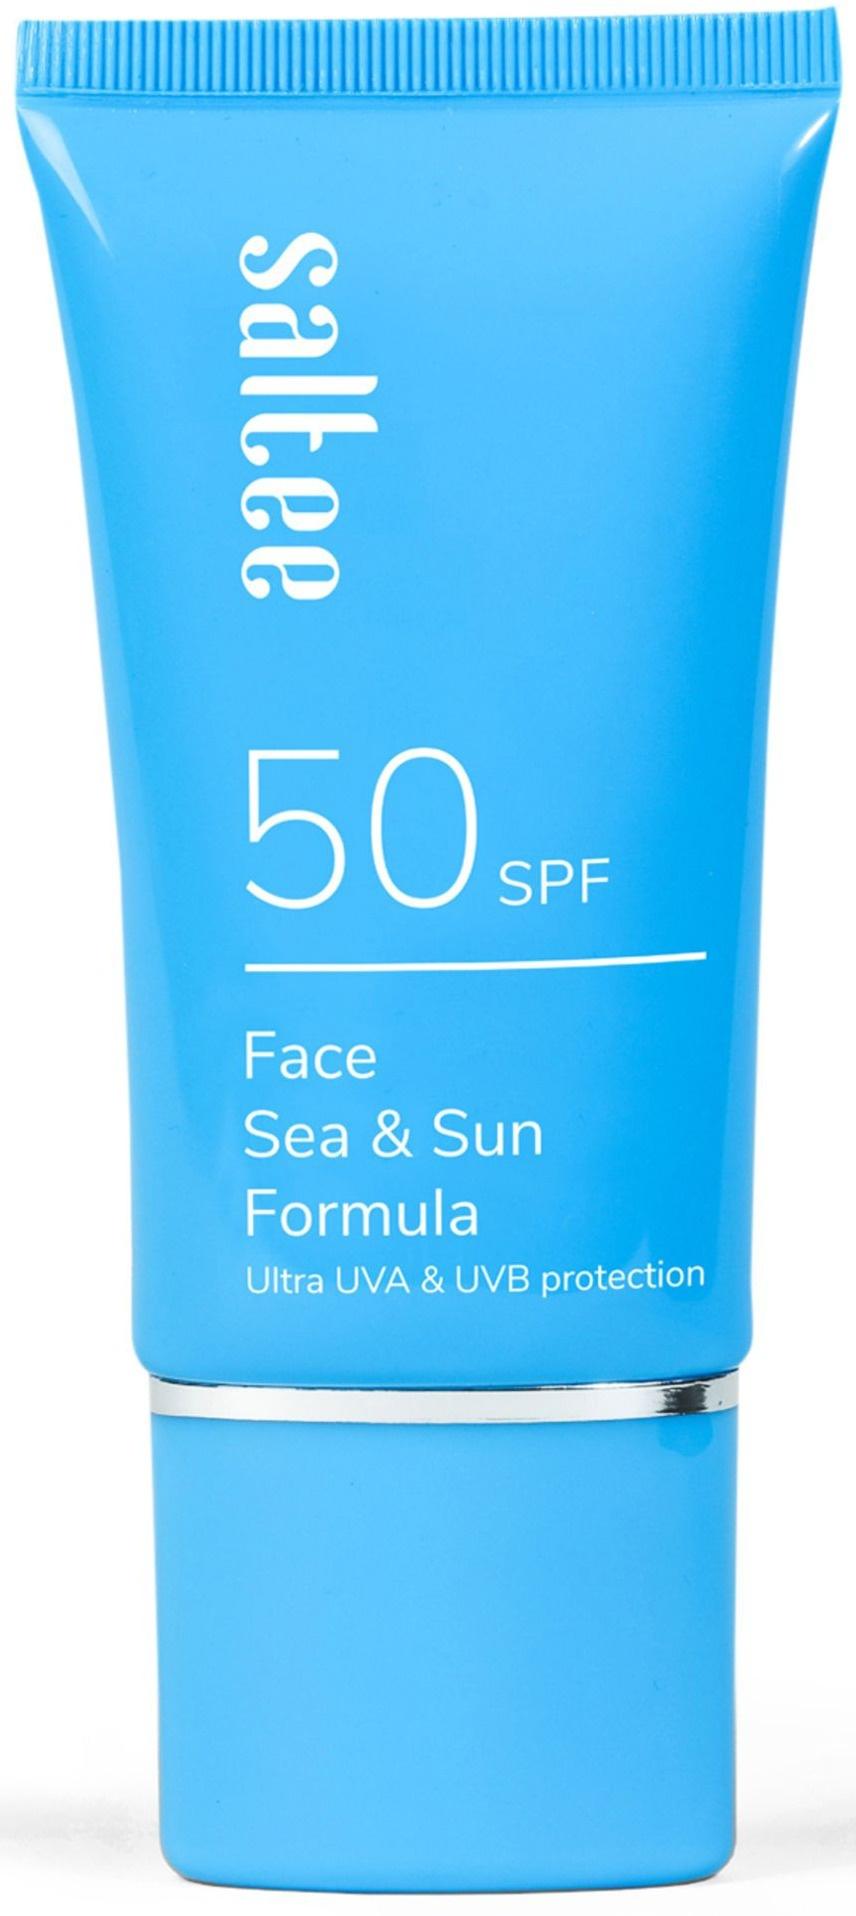 Saltee Face Sea & Sun Formula SPF 50